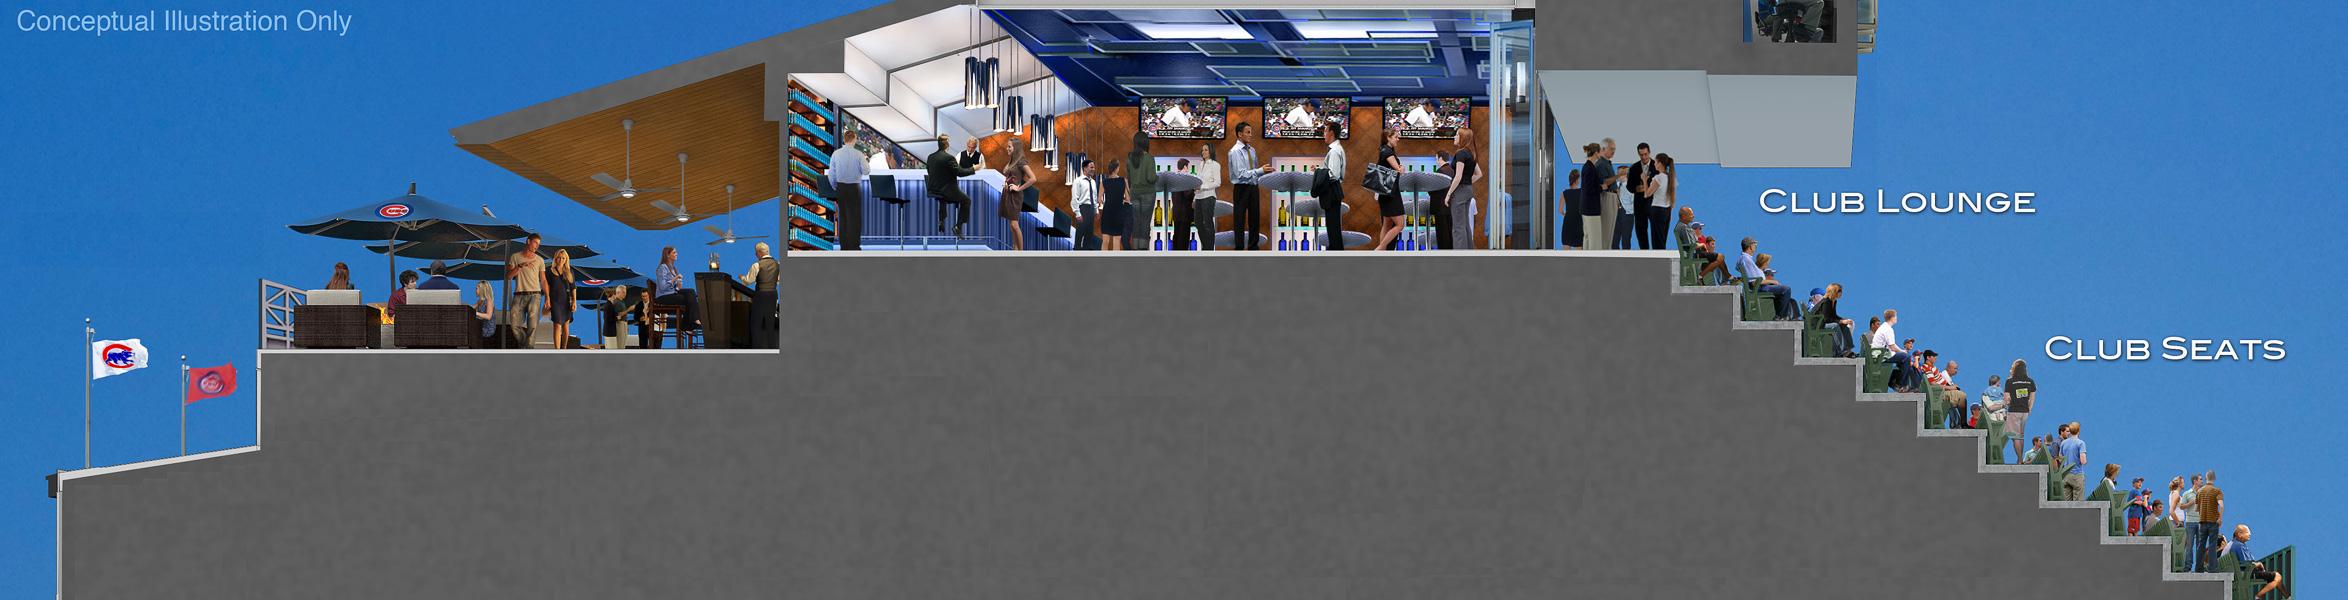 Wrigley Renderings - Club Patio Lounge Seats